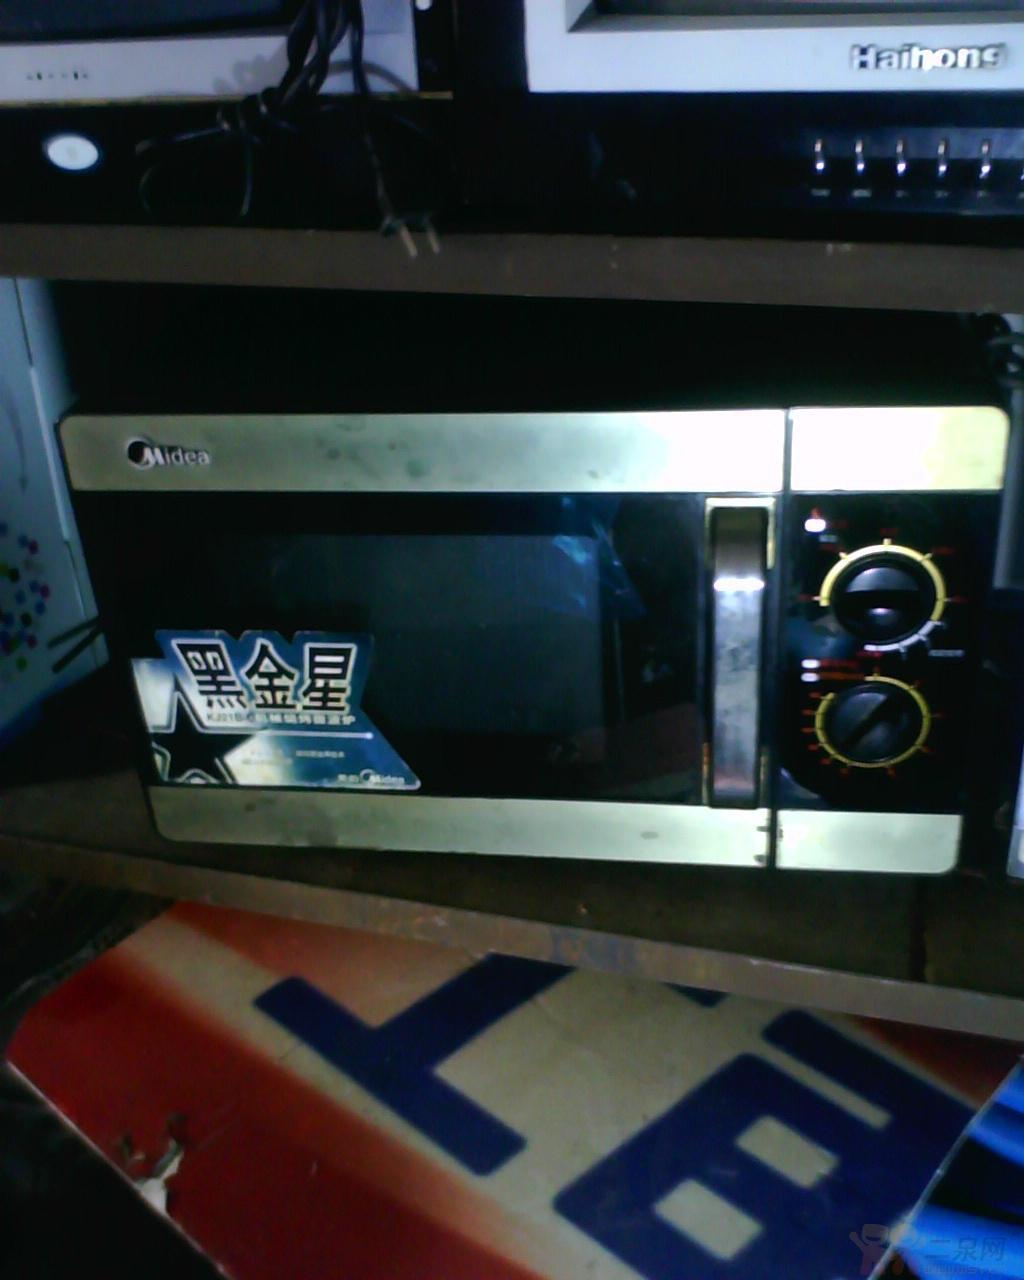 美的电磁炉主控板/主板sk2105/sk2103/sk2106/sk